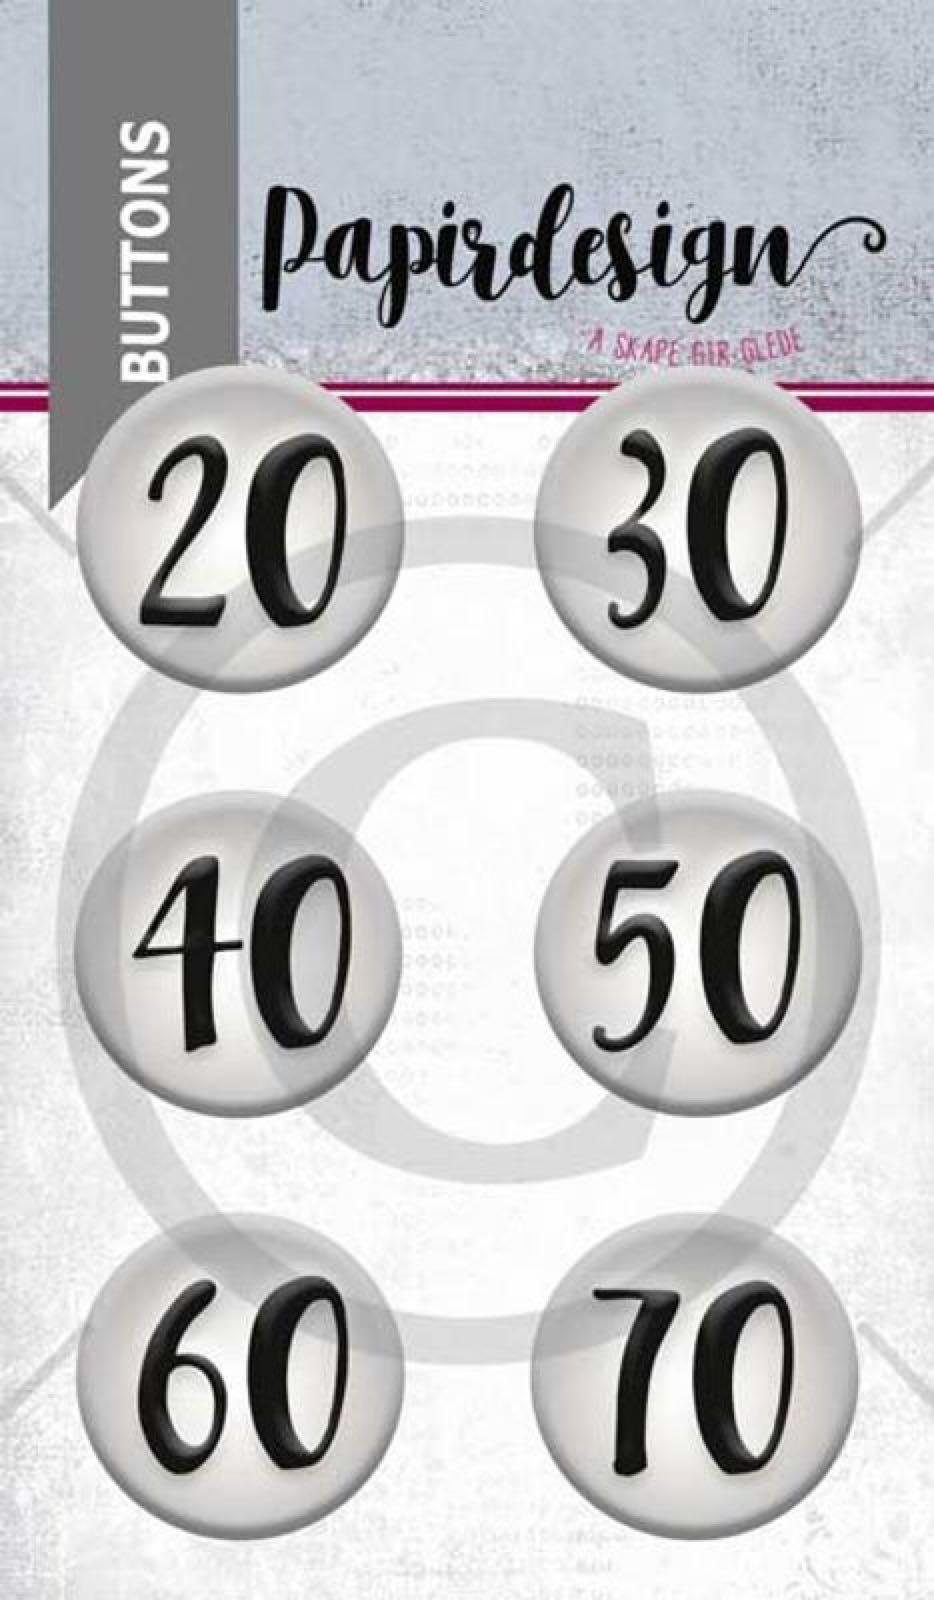 Papirdesign buttons runddager